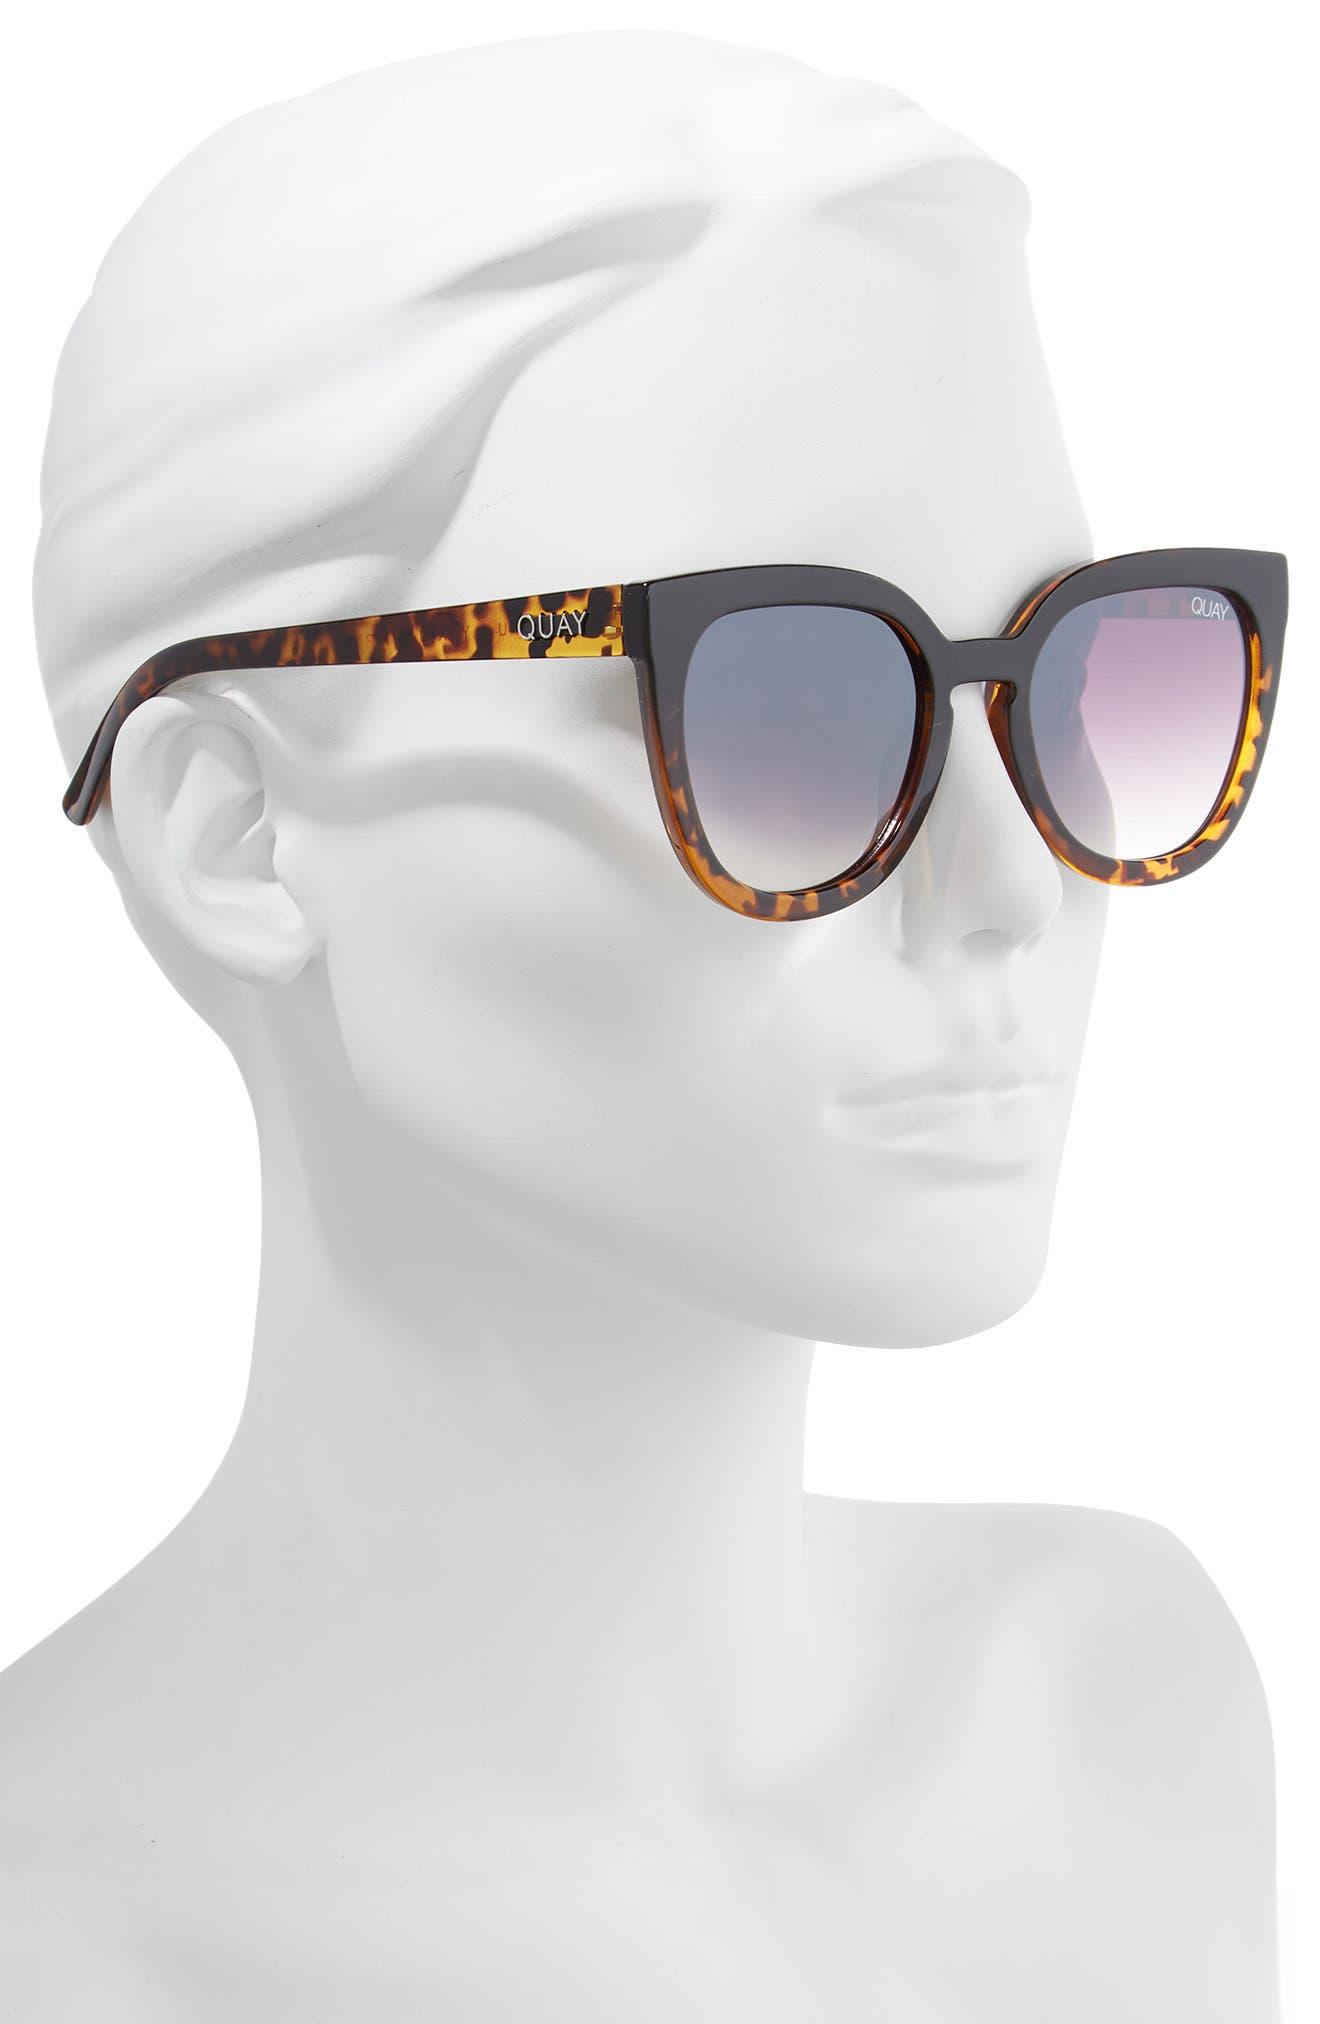 QUAY AUSTRALIA, Noosa 50mm Square Sunglasses, Alternate thumbnail 2, color, 006